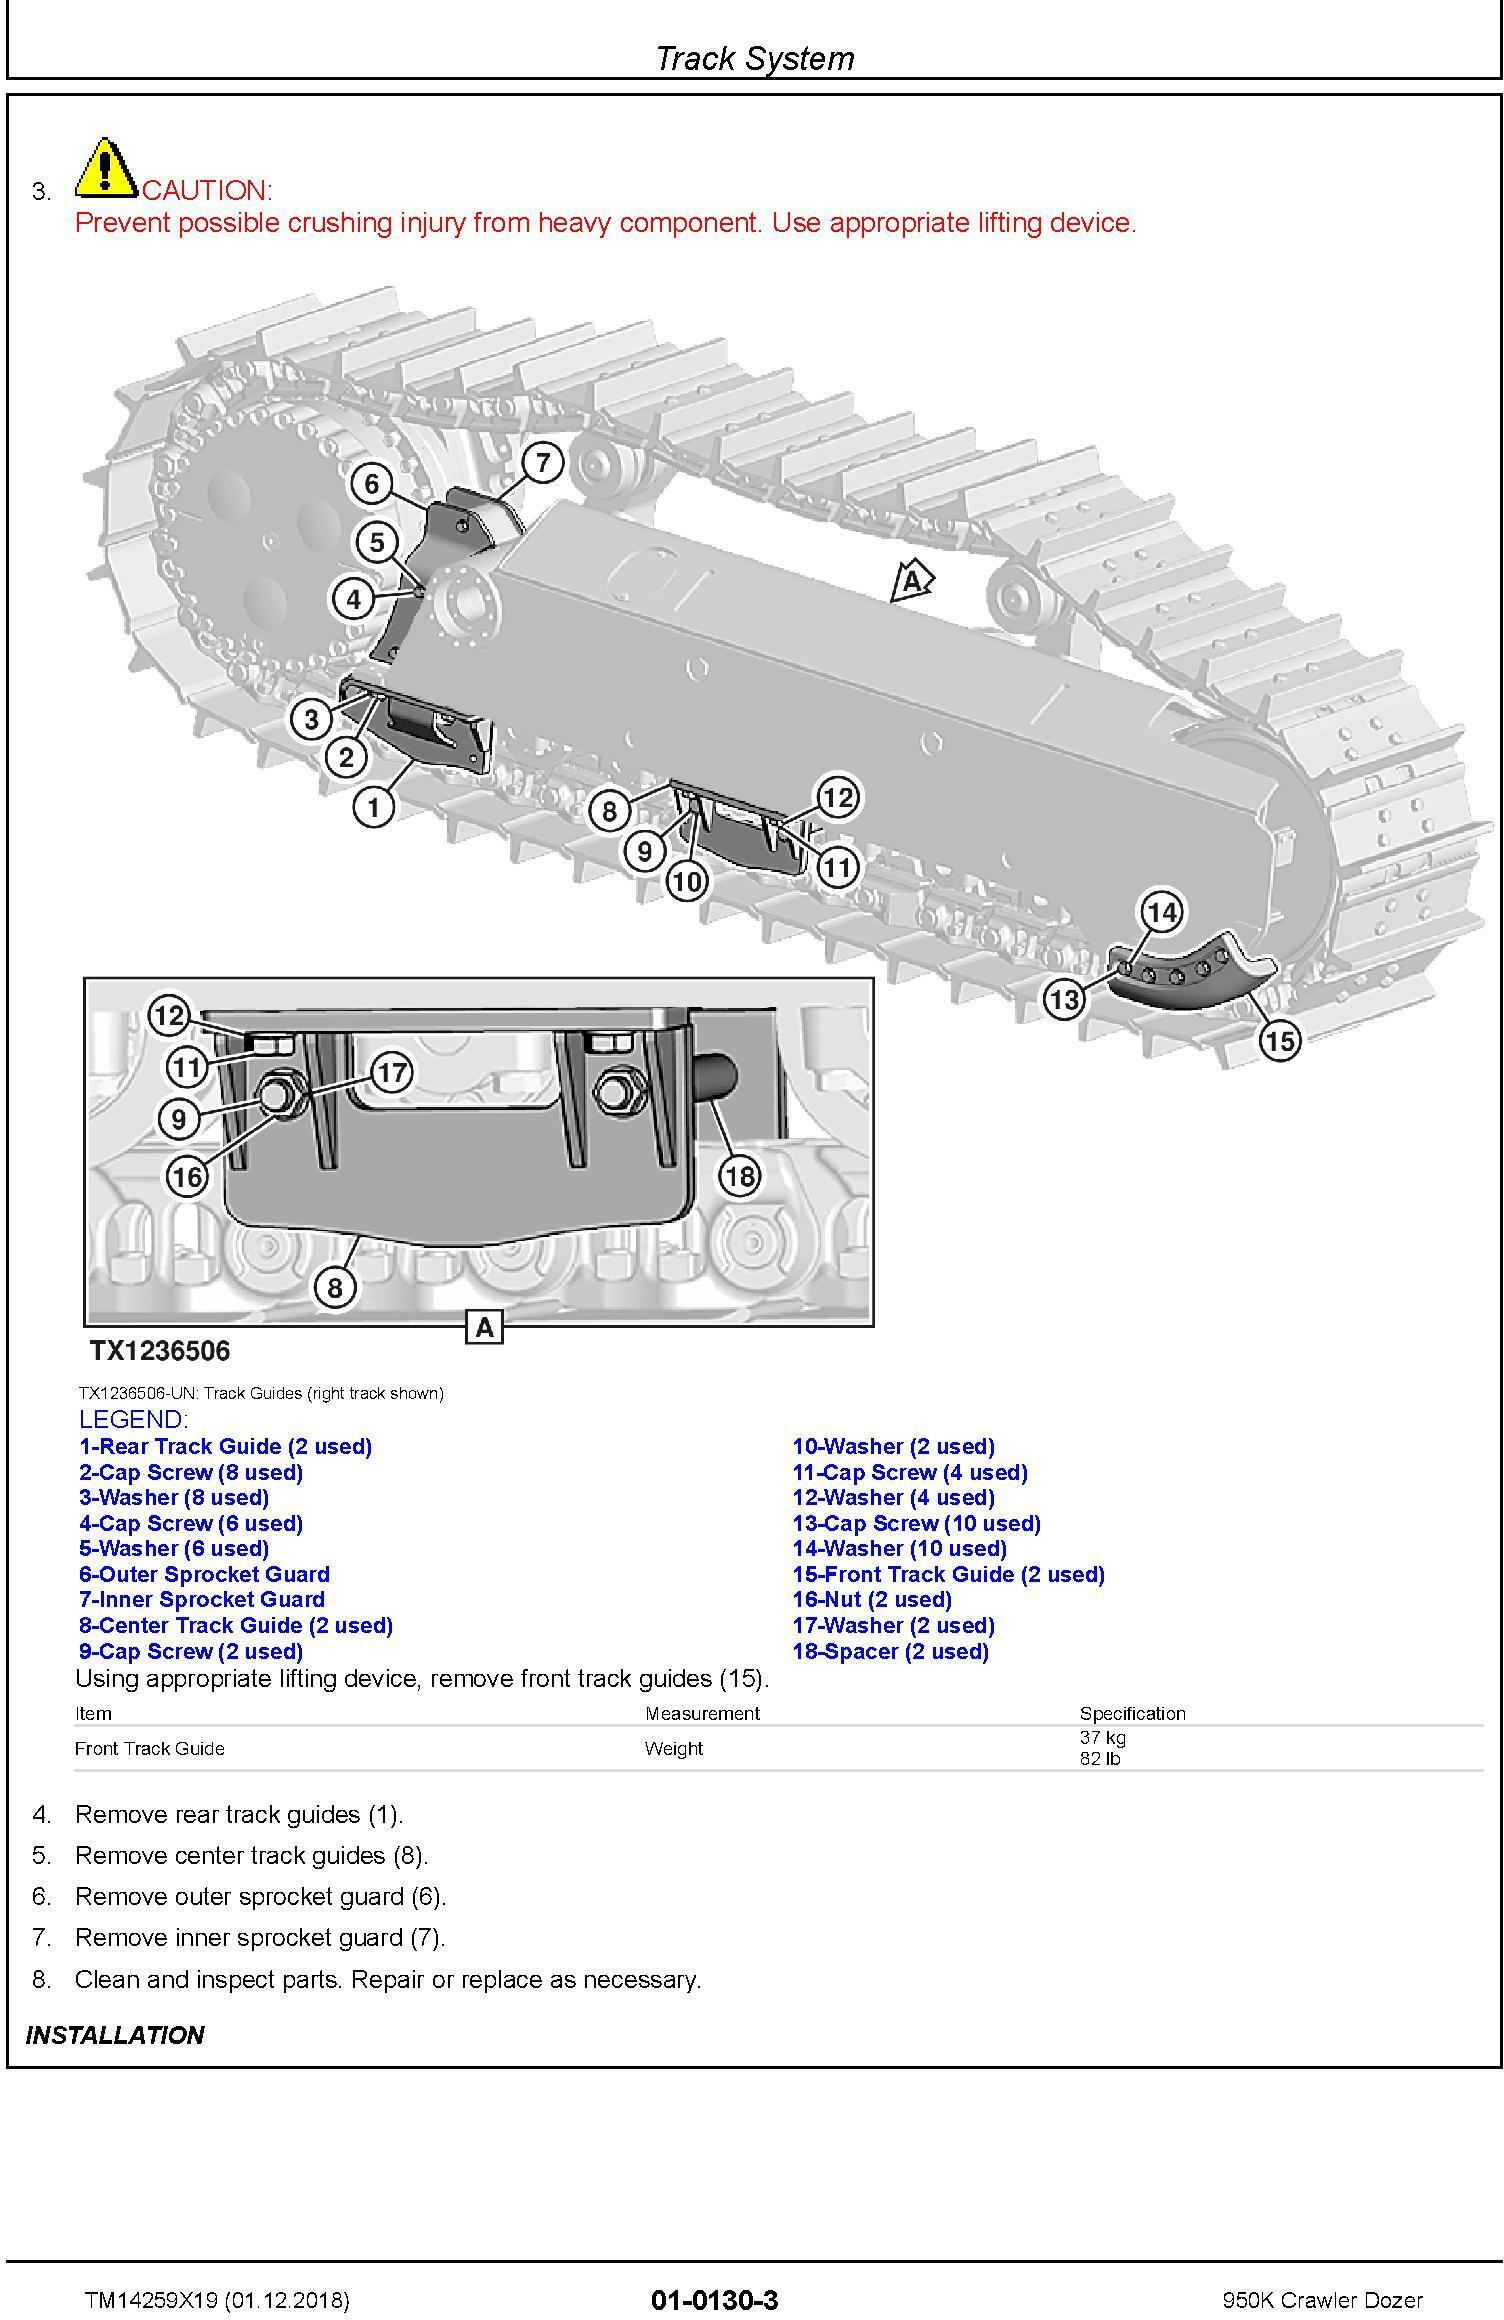 John Deere 950K (SN. C310401-338999) Crawler Dozer Repair Technical Service Manual (TM14259X19) - 1